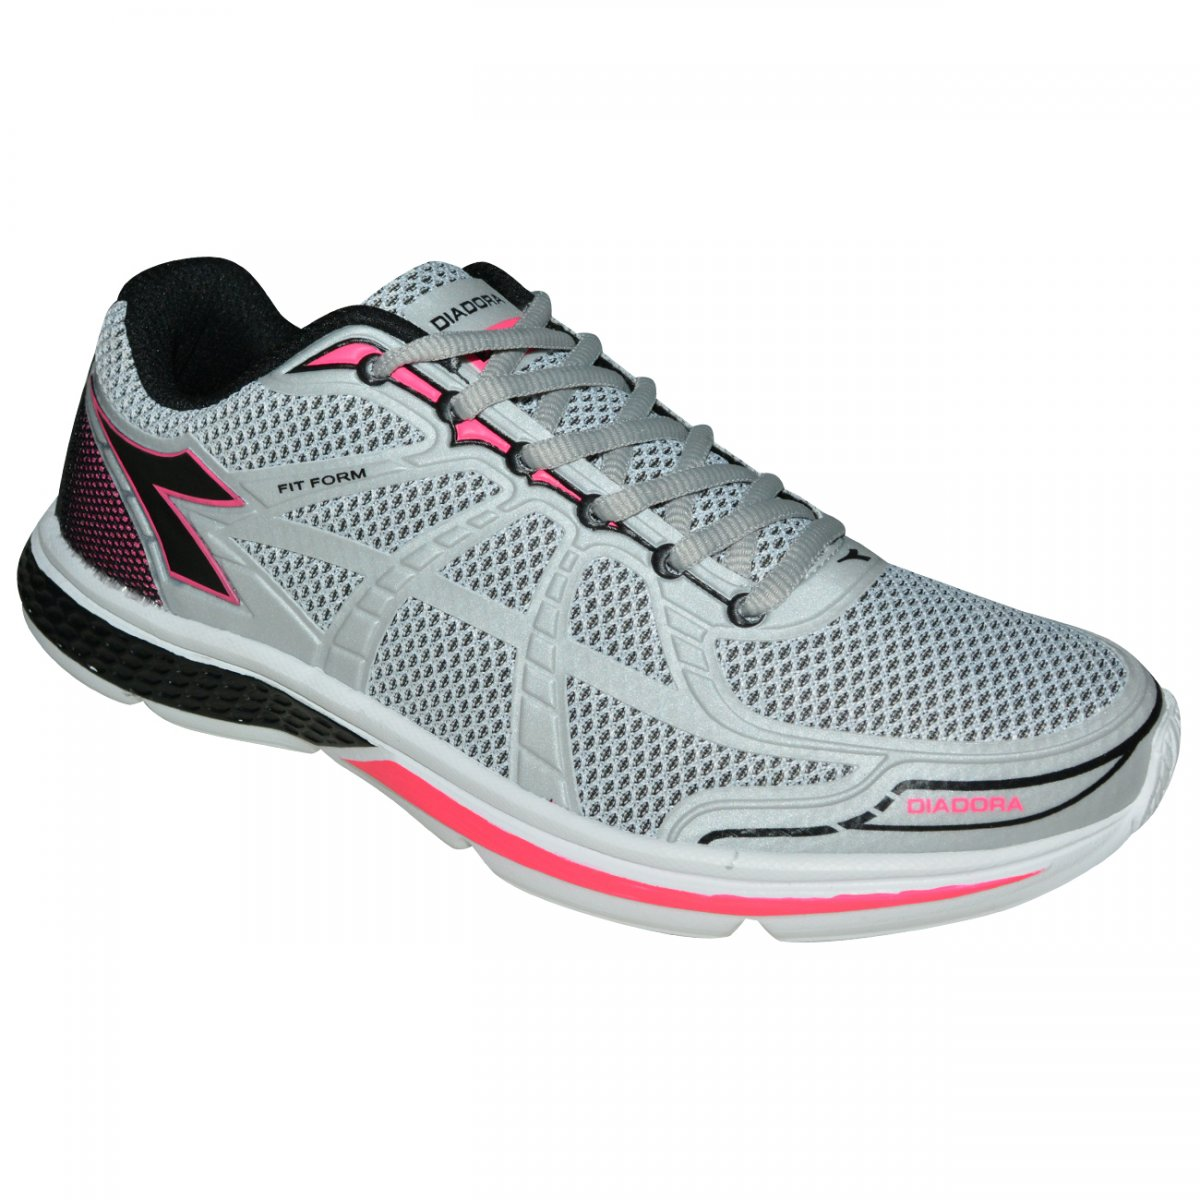 d66b725488 Tenis Diadora Fit Form 125604 C3329 - Cinza pink preto - Chuteira Nike